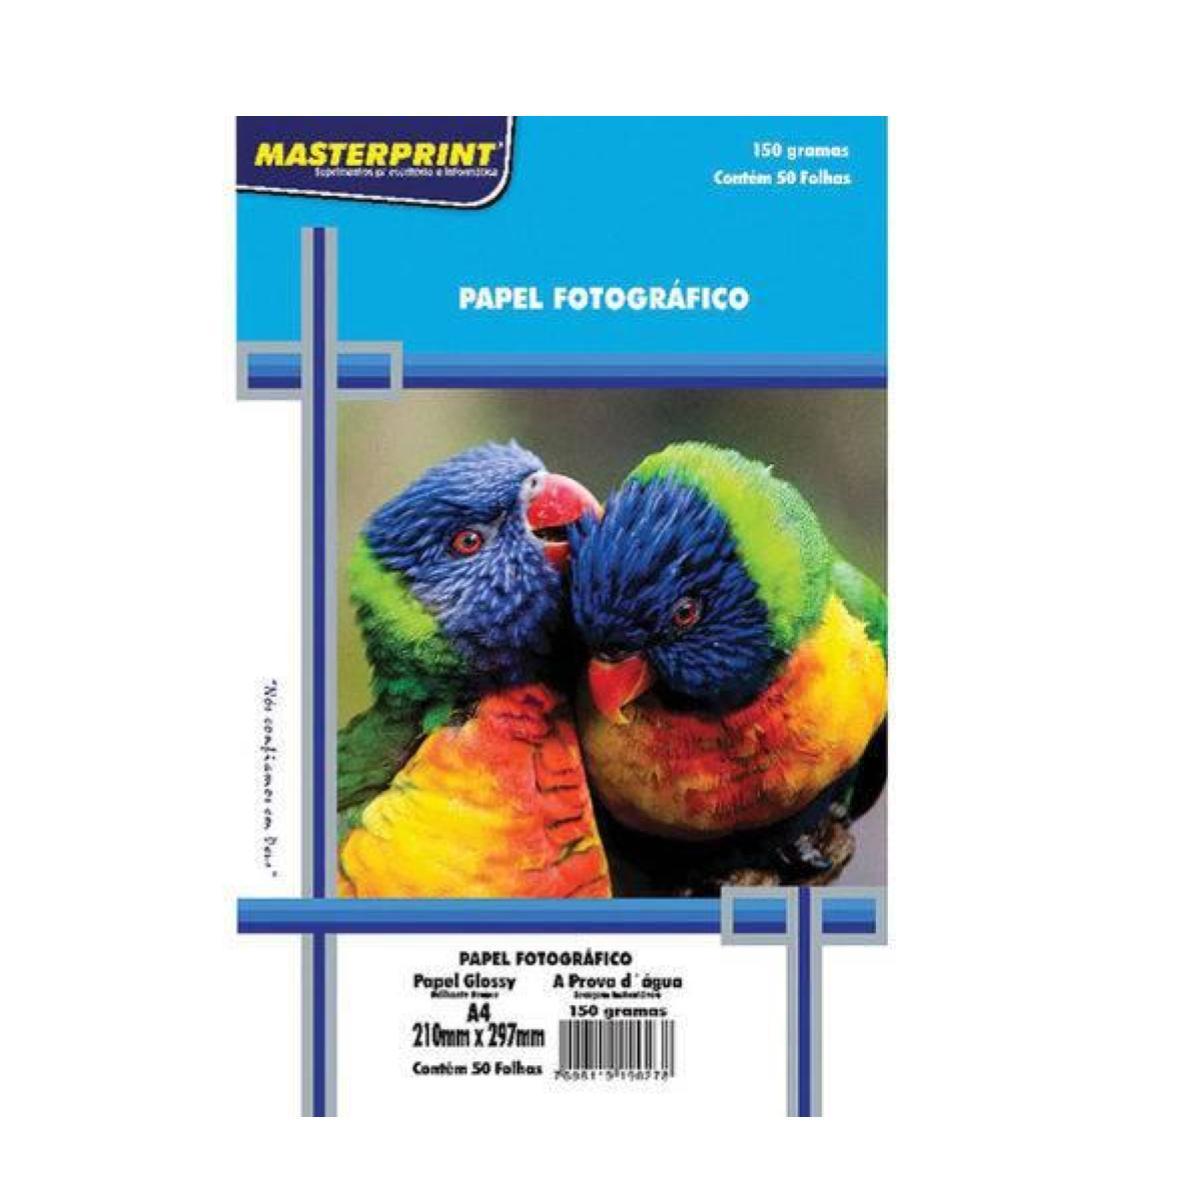 Glossy Paper A4 150g Masterprint